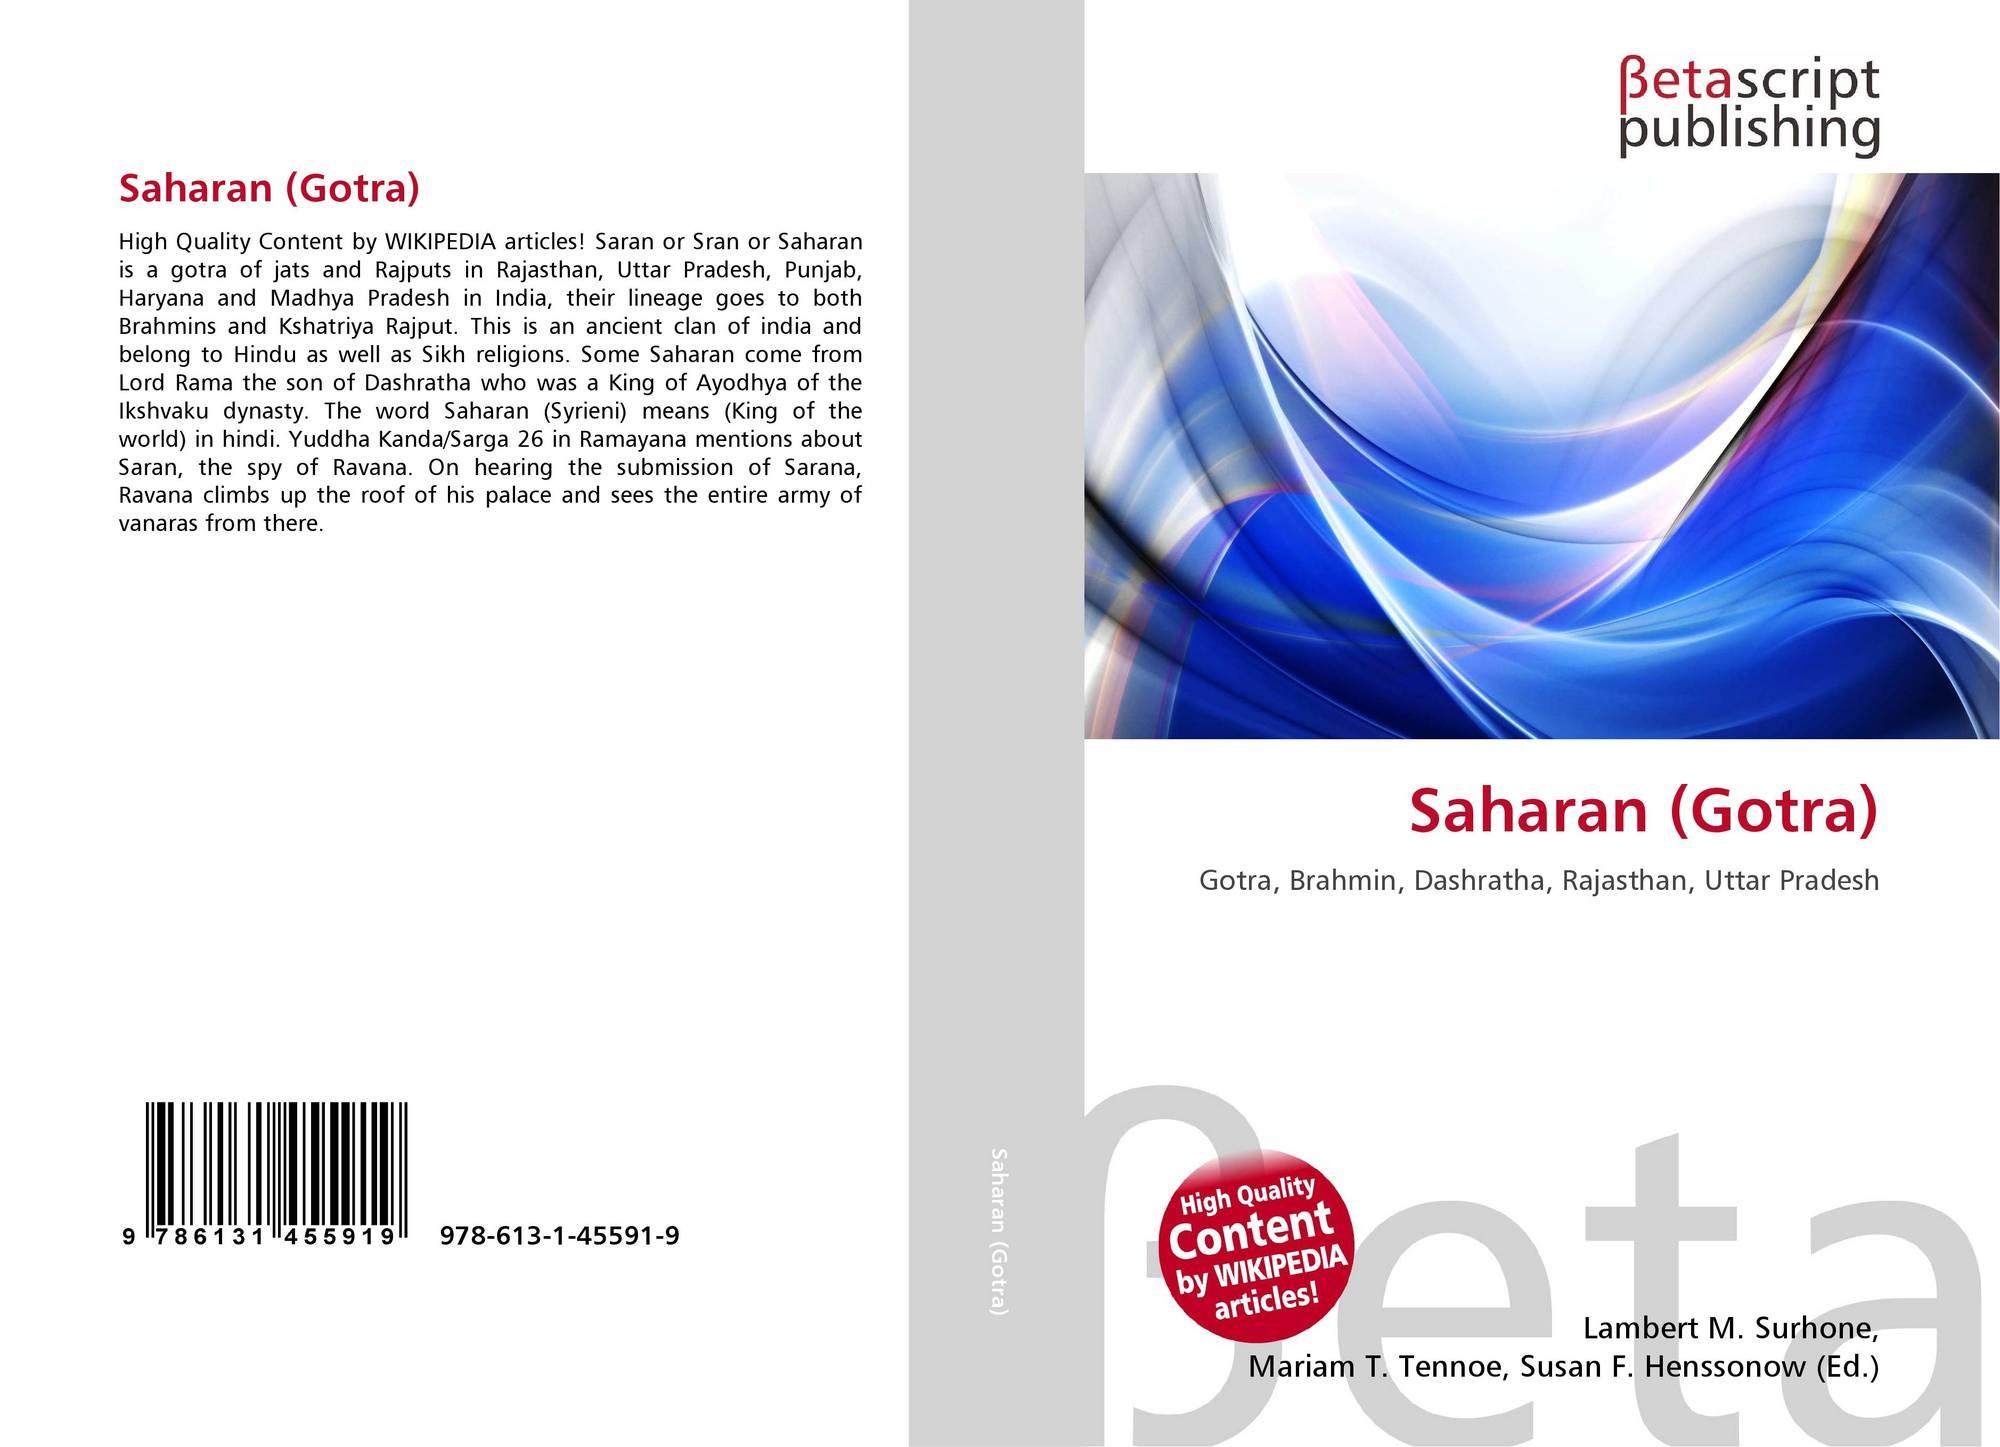 Saharan (Gotra), 978-613-1-45591-9, 6131455910 ,9786131455919